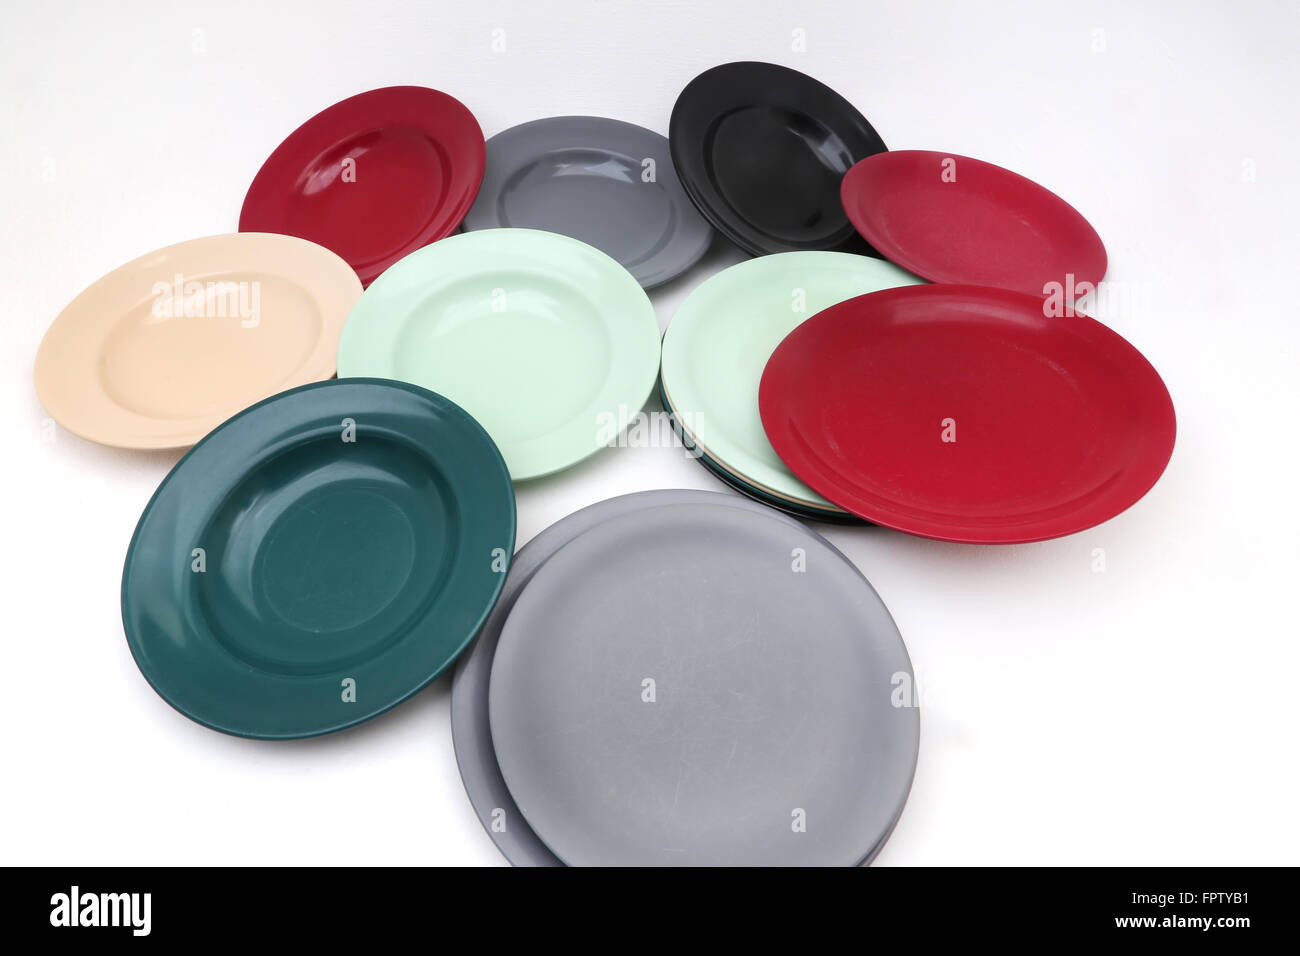 Vintage 1950\u0027s Melamine Plates And Bowls & Vintage 1950\u0027s Melamine Plates And Bowls Stock Photo: 100122597 ...